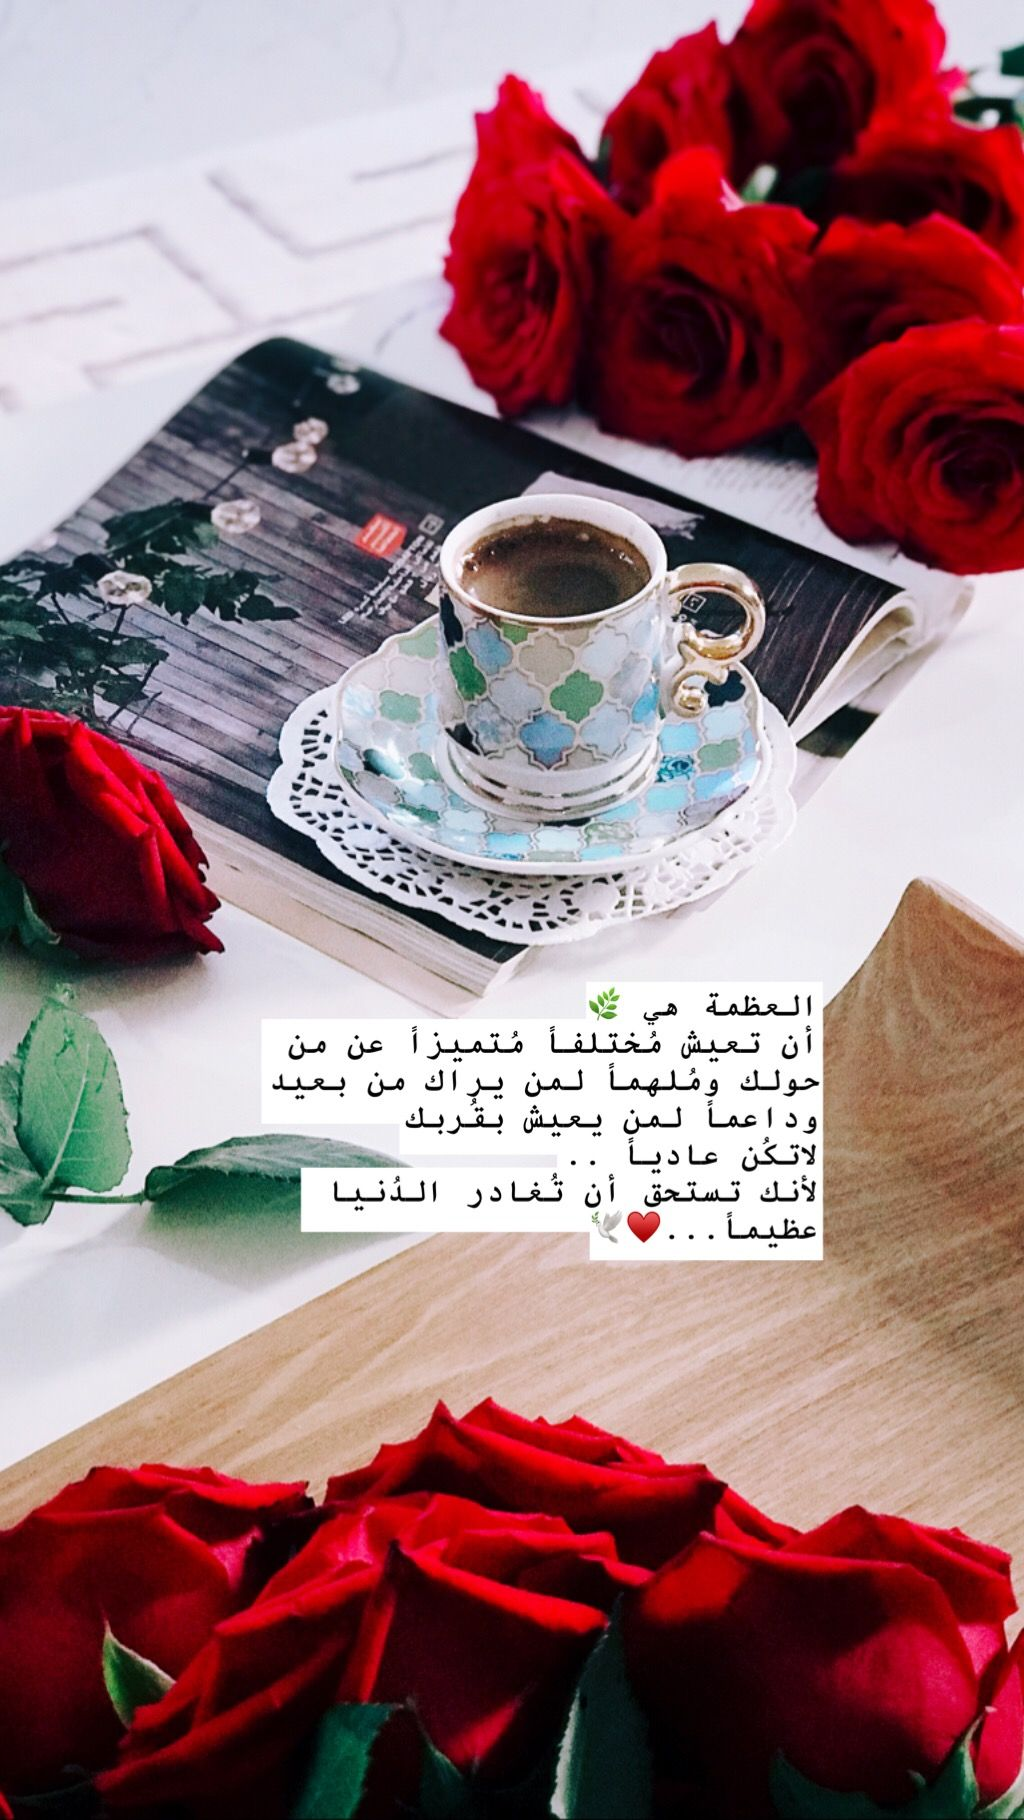 Insta Hind99alsalem Arabic Quotes Arabic Words Snapchat